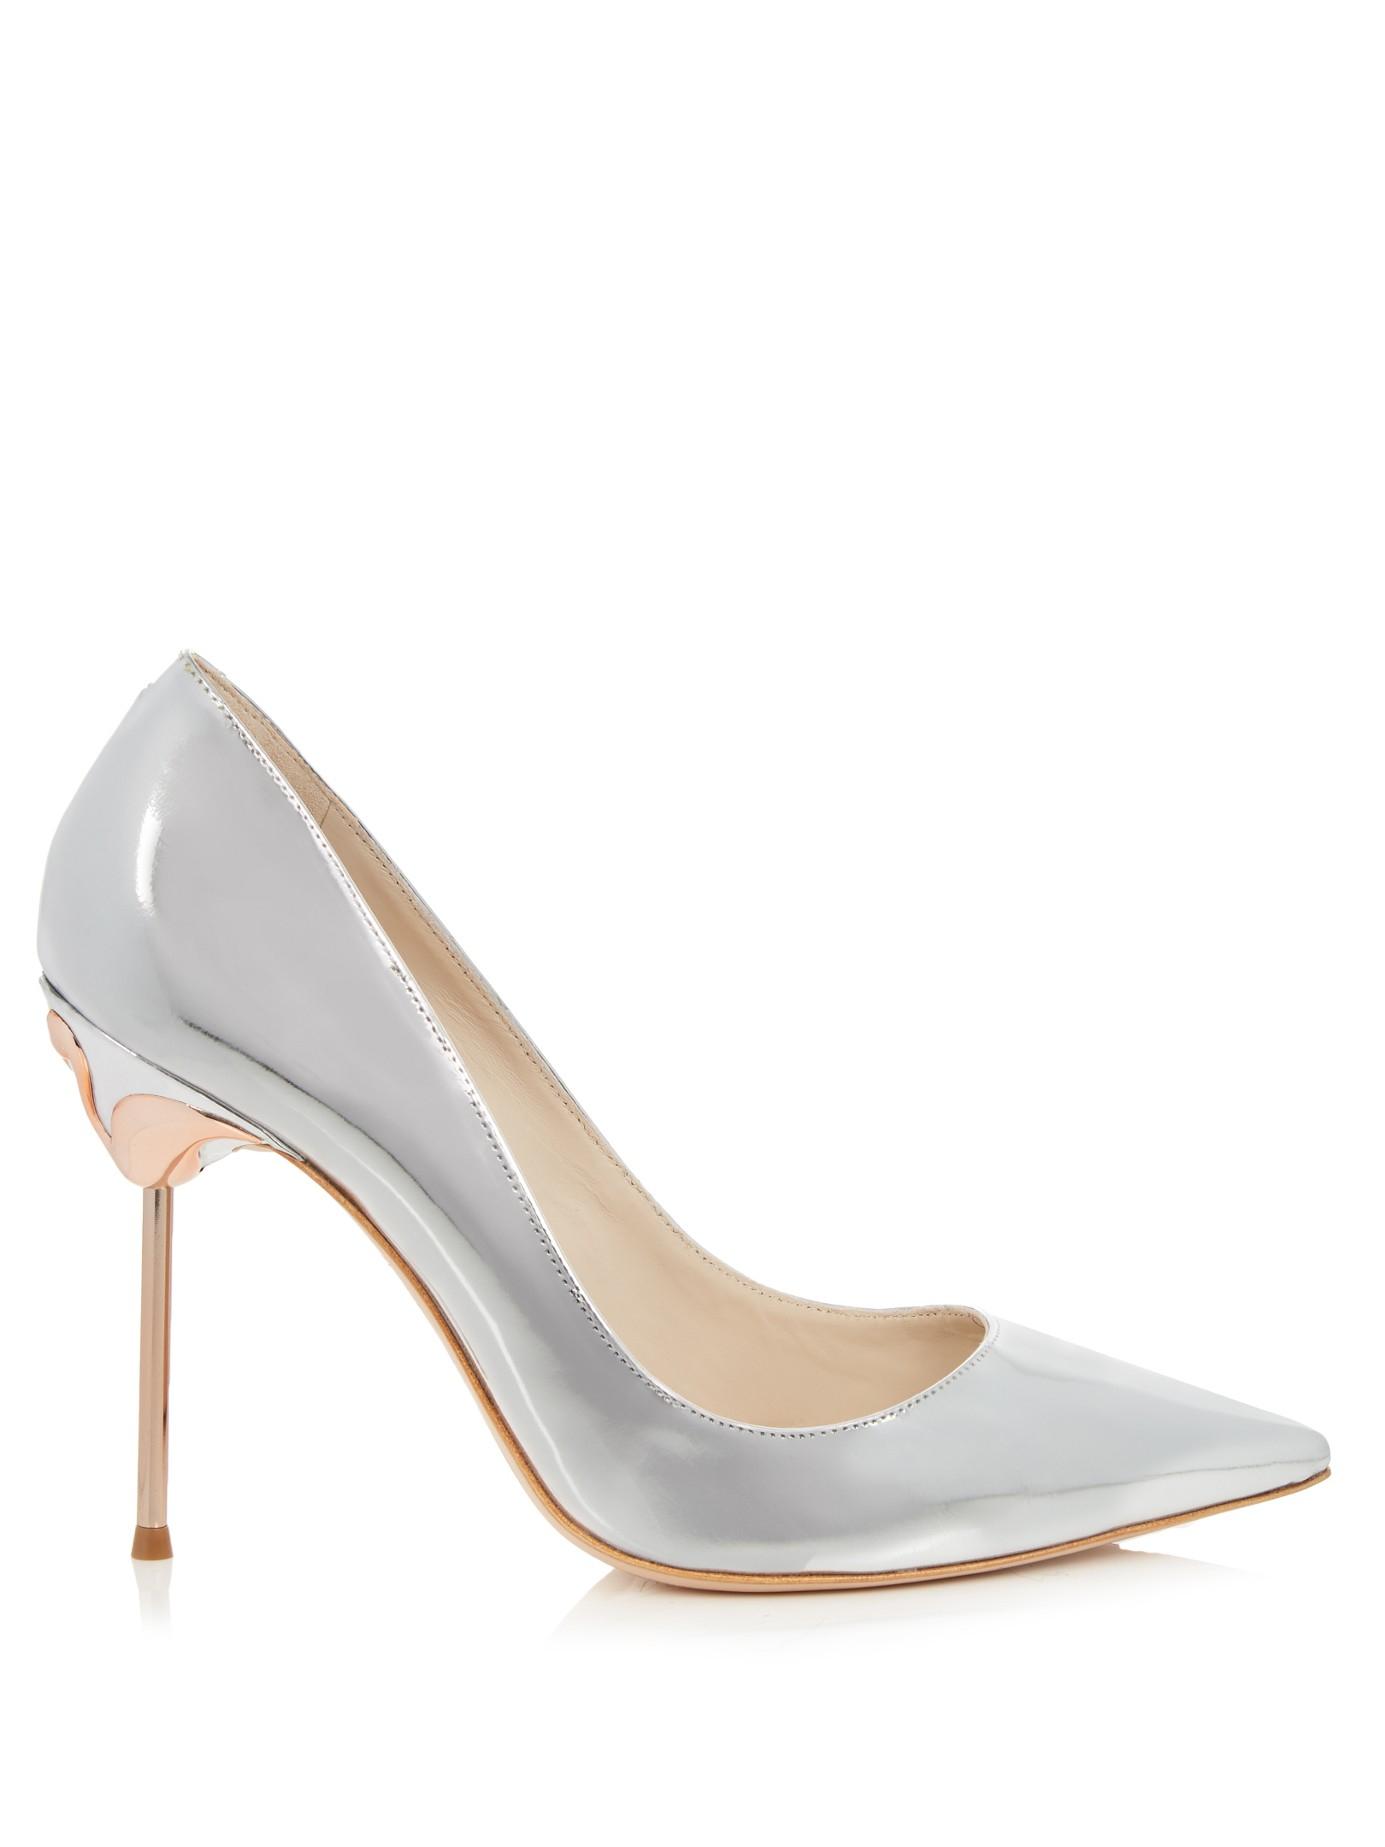 Sophia webster coco flamingo heel metallic leather pumps for Sophia webster wedding shoes